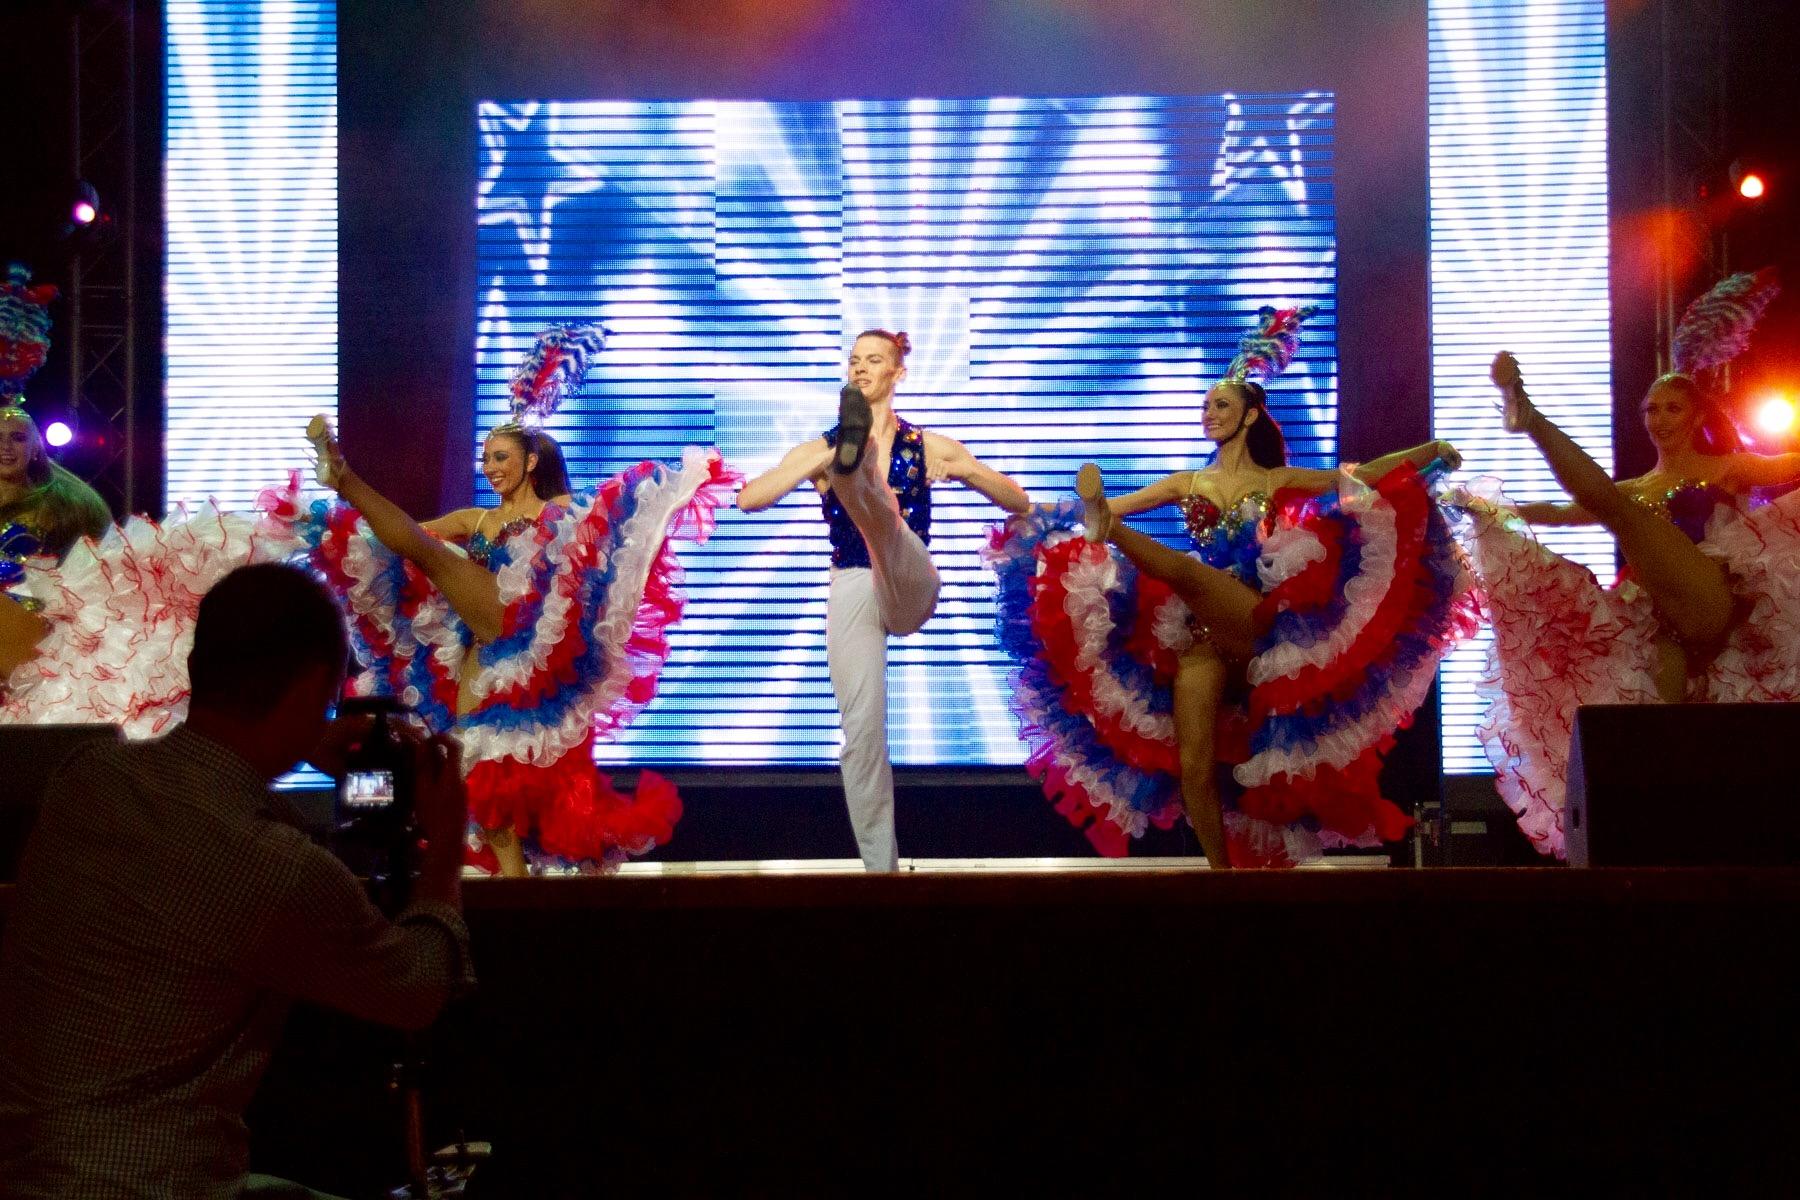 Канкан Париж шоу Гранд в Москве